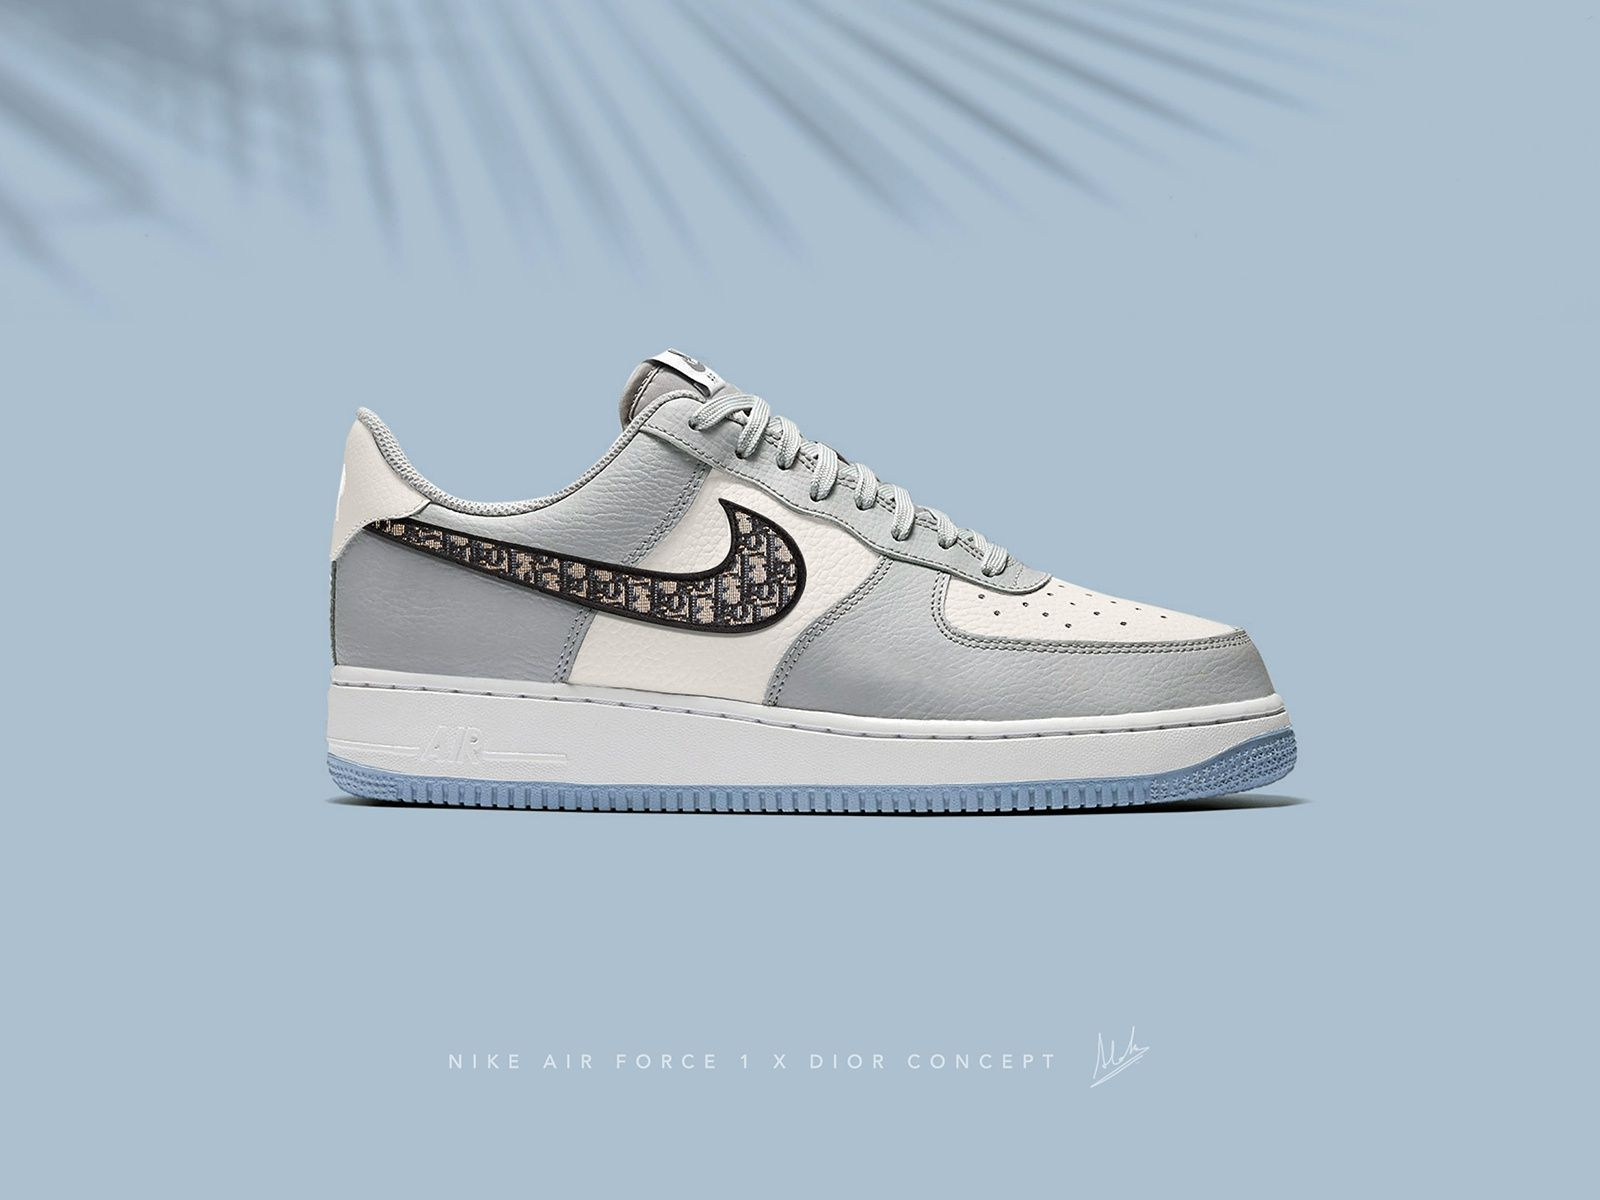 Nike AirForce 1 x Dior | Sneakers men fashion, Nike airforce 1, Nike